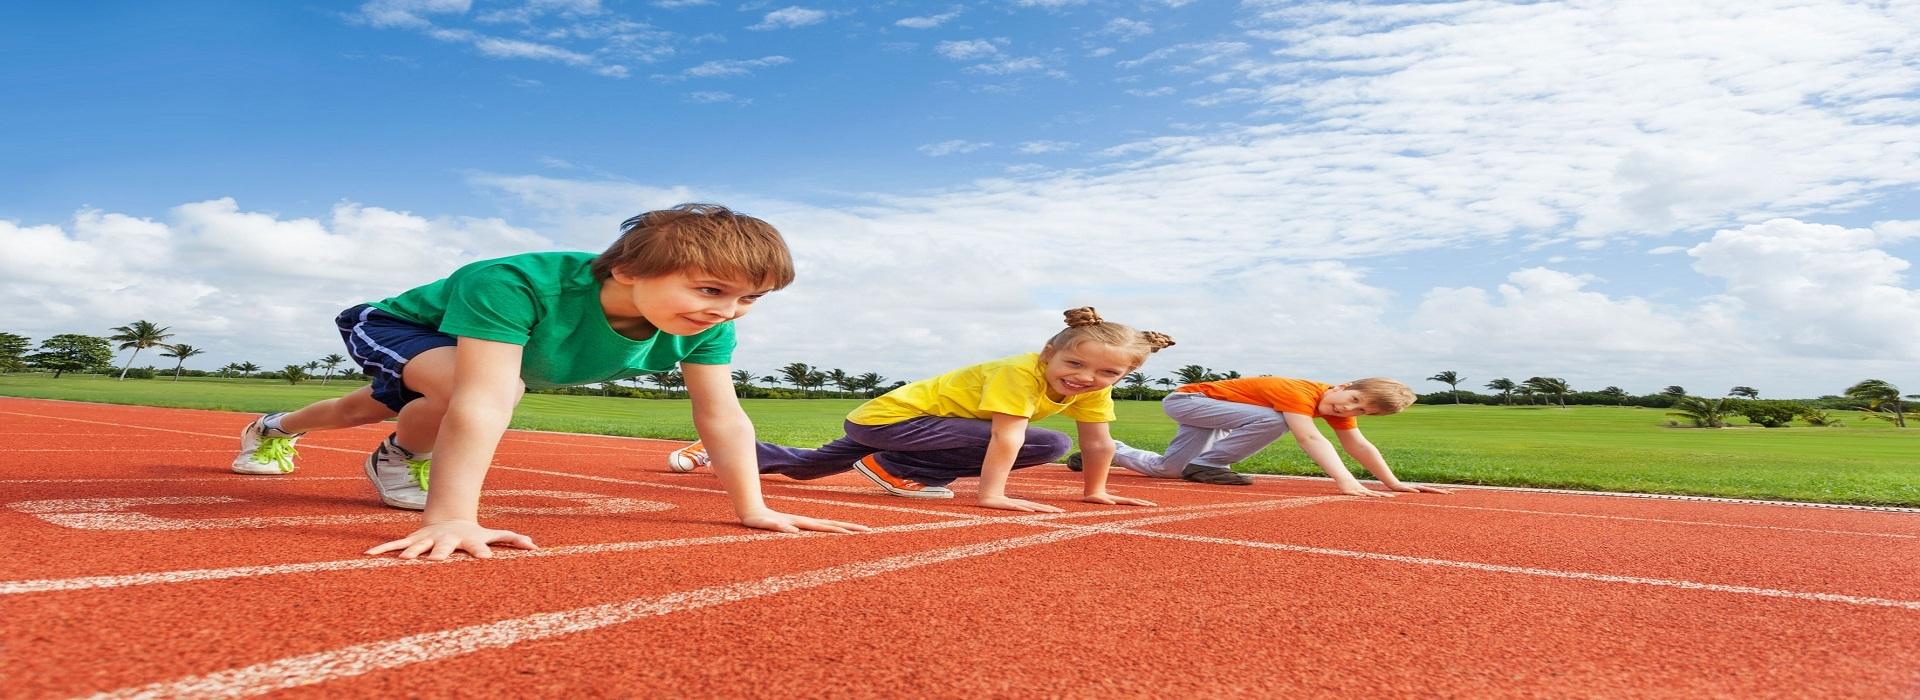 ExtraOffre Sport Kids Slider